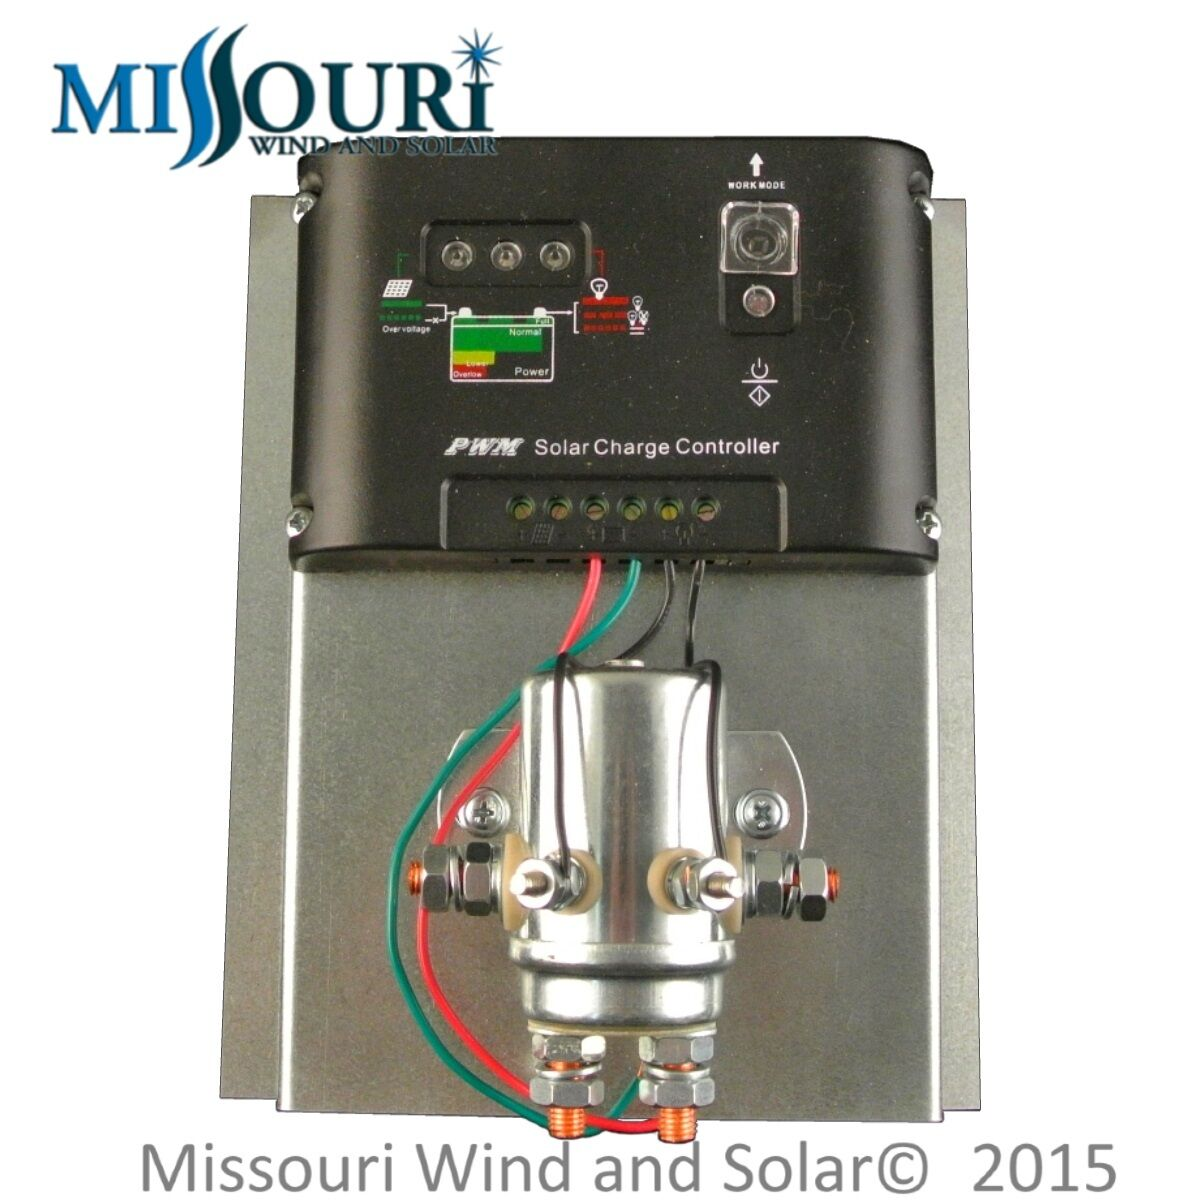 12 volt 400 amp 10 000 watt charge controller for wind turbine solar rh ebay com